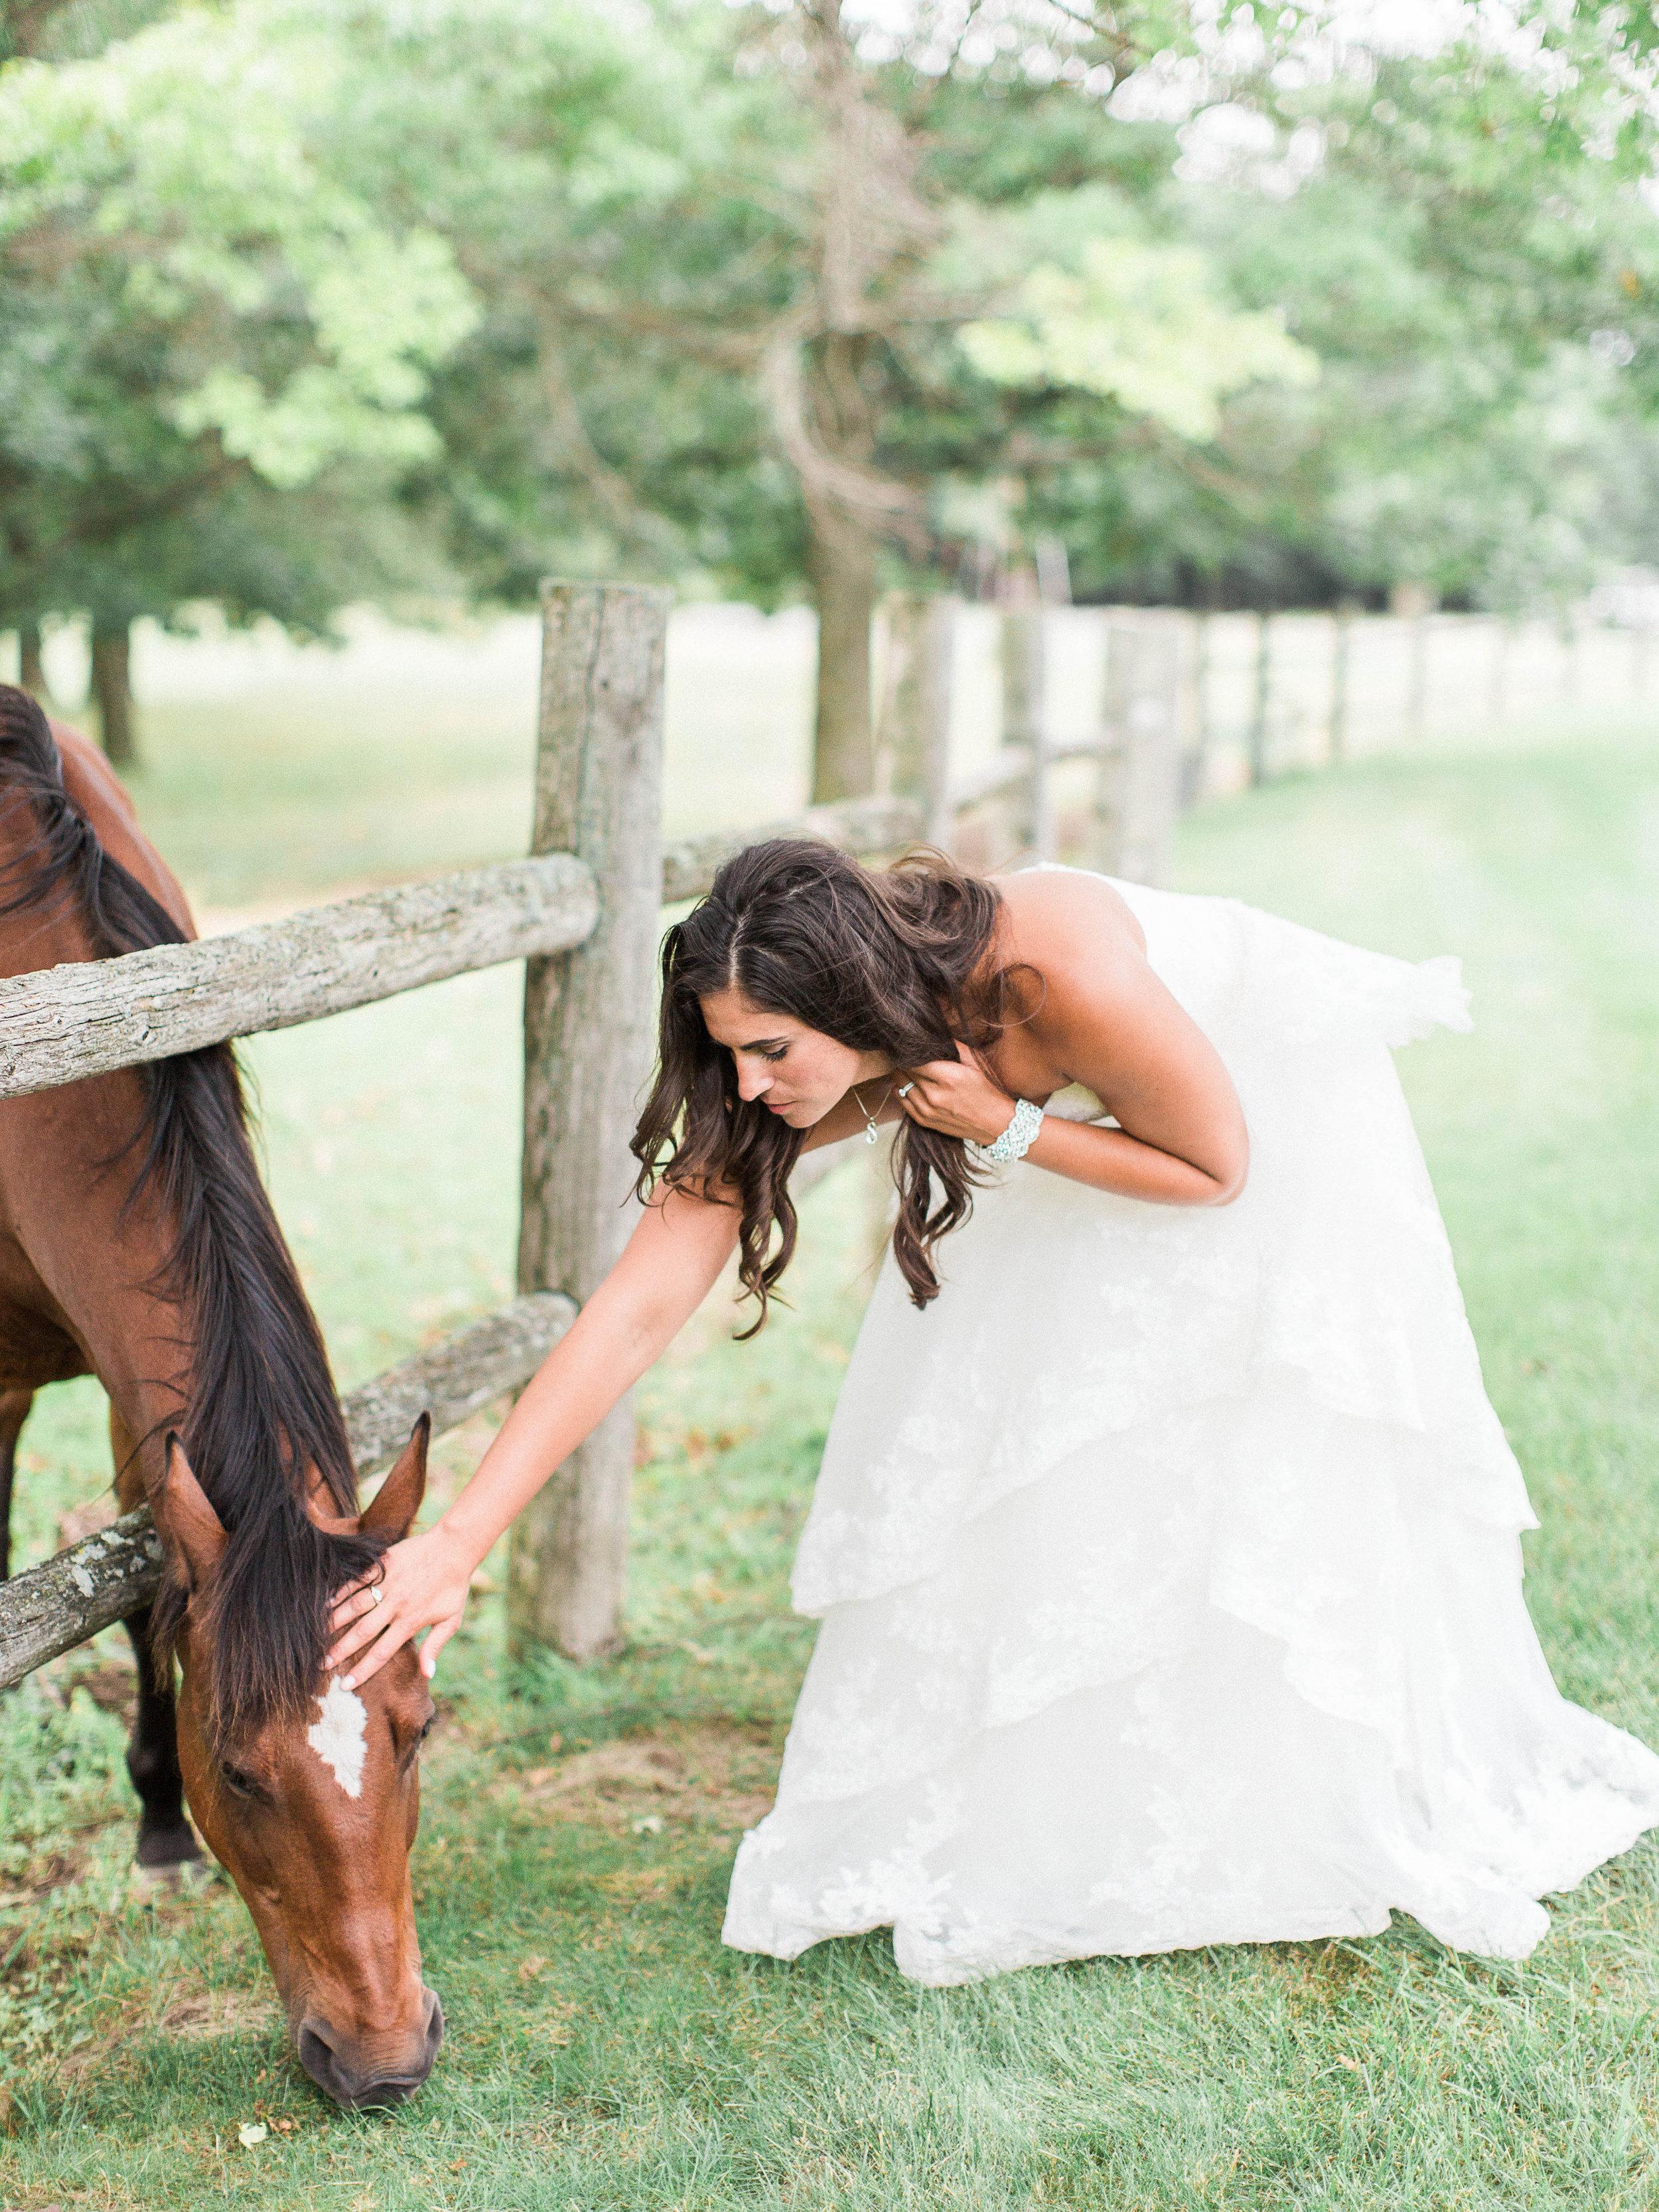 ERIC AND HALLIE WEDDING-HI RESOLUTION FOR PRINTING-0755.jpg